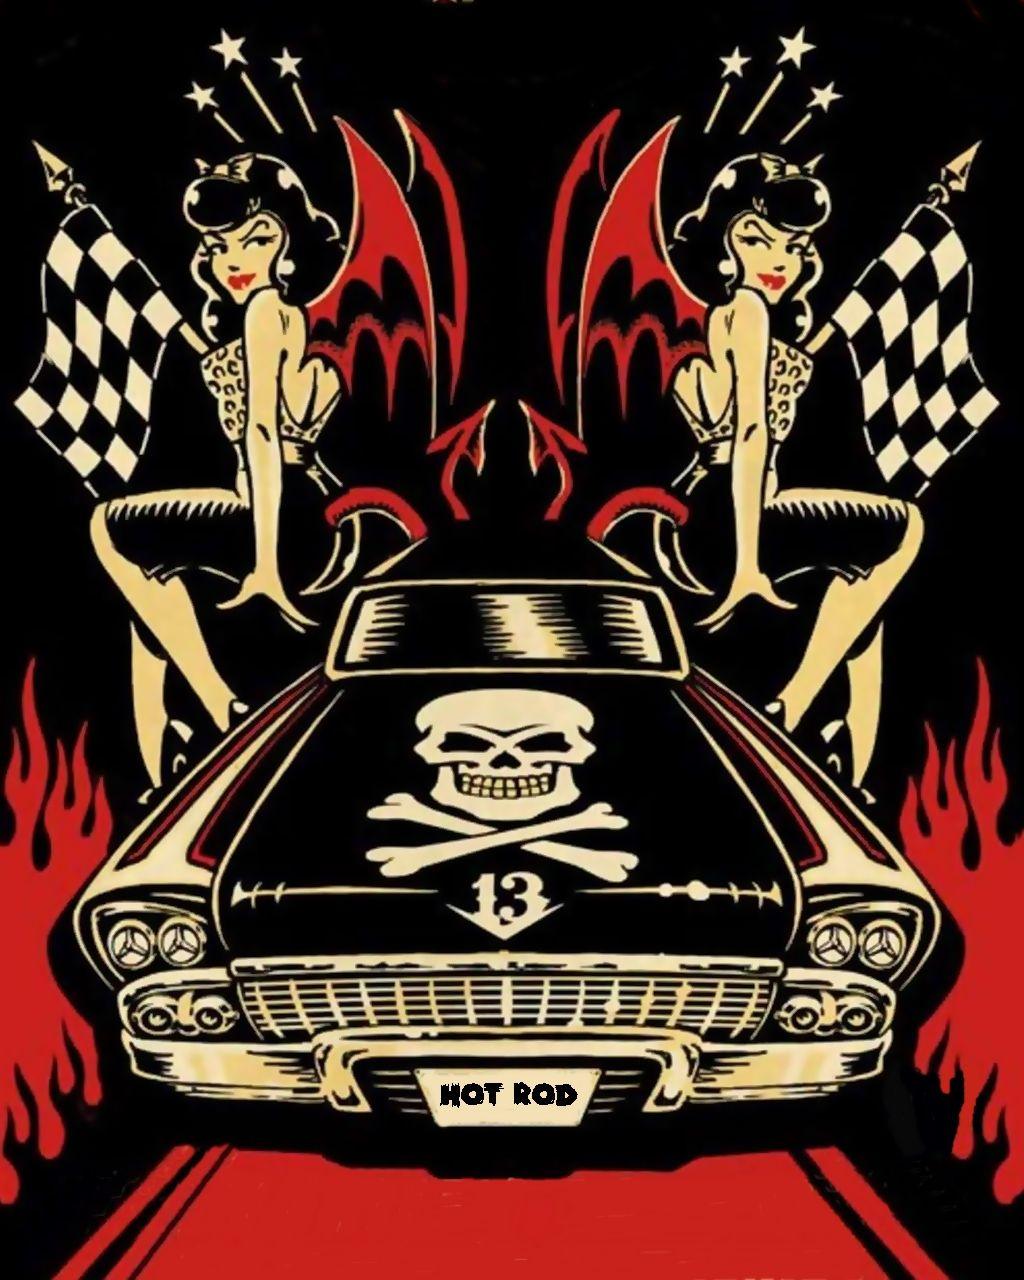 poster Art hot rod rockabilly by pave65.deviantart.com on ...